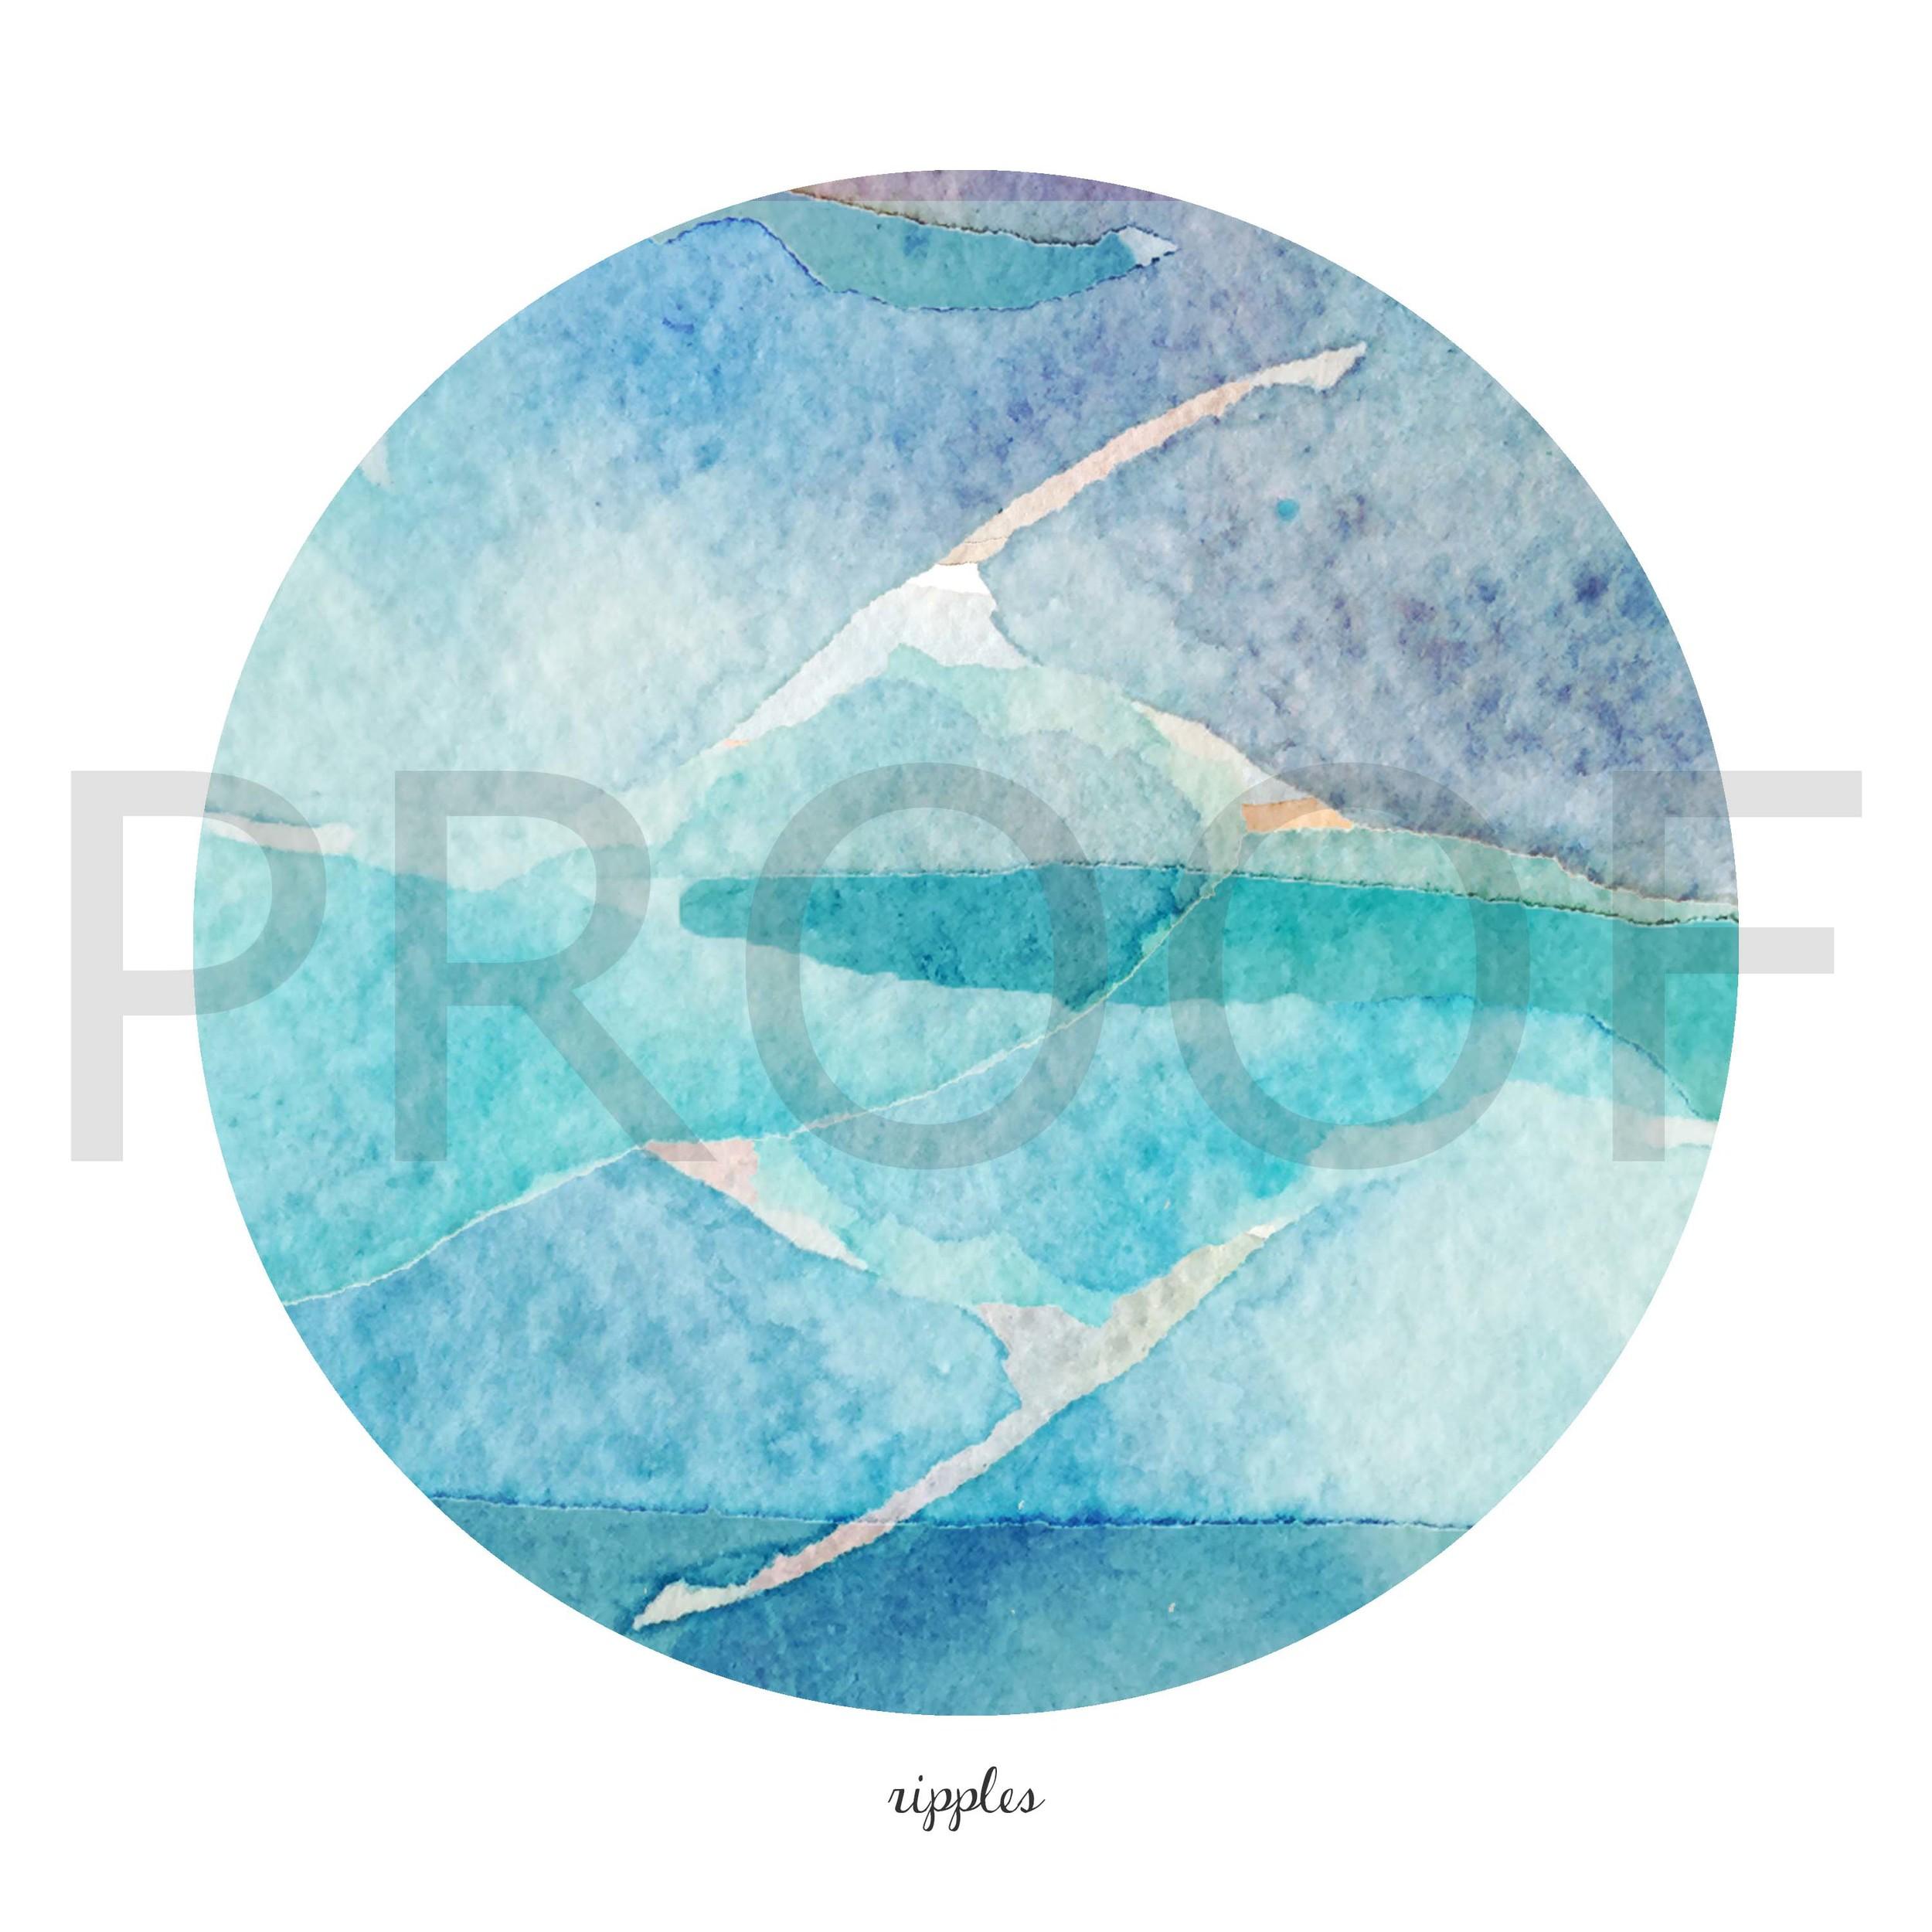 ripples-circle-proof.jpg